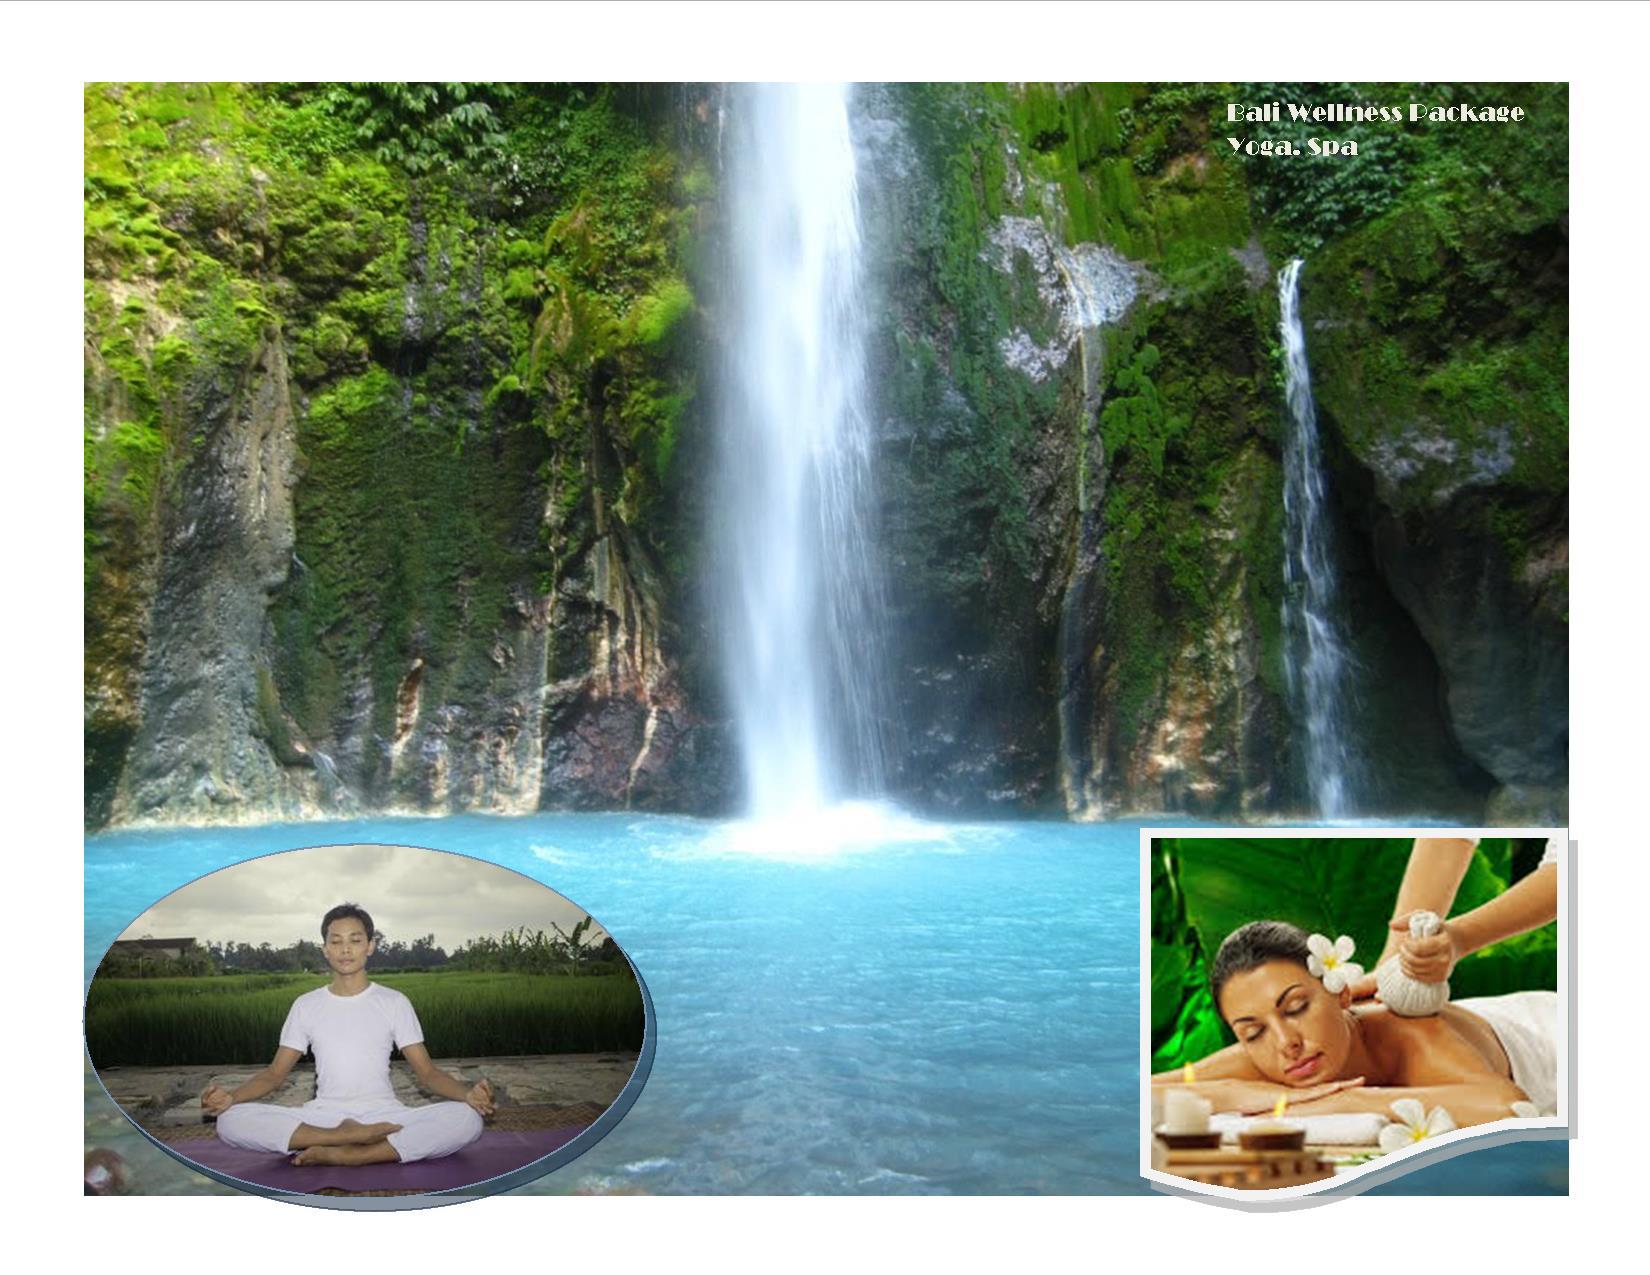 Bali Wellness Package 14 Days 13 Nights